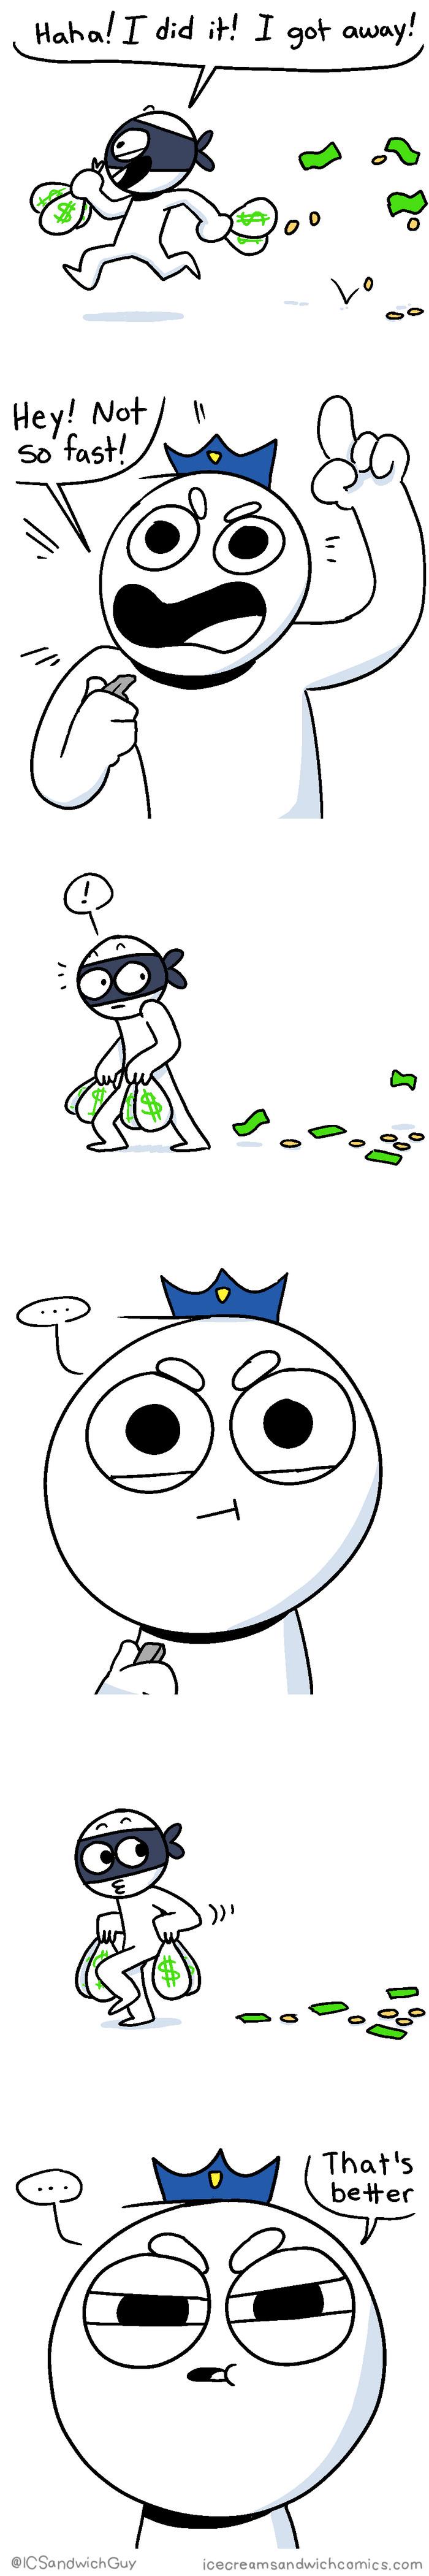 Ice Cream Sandwich Comics